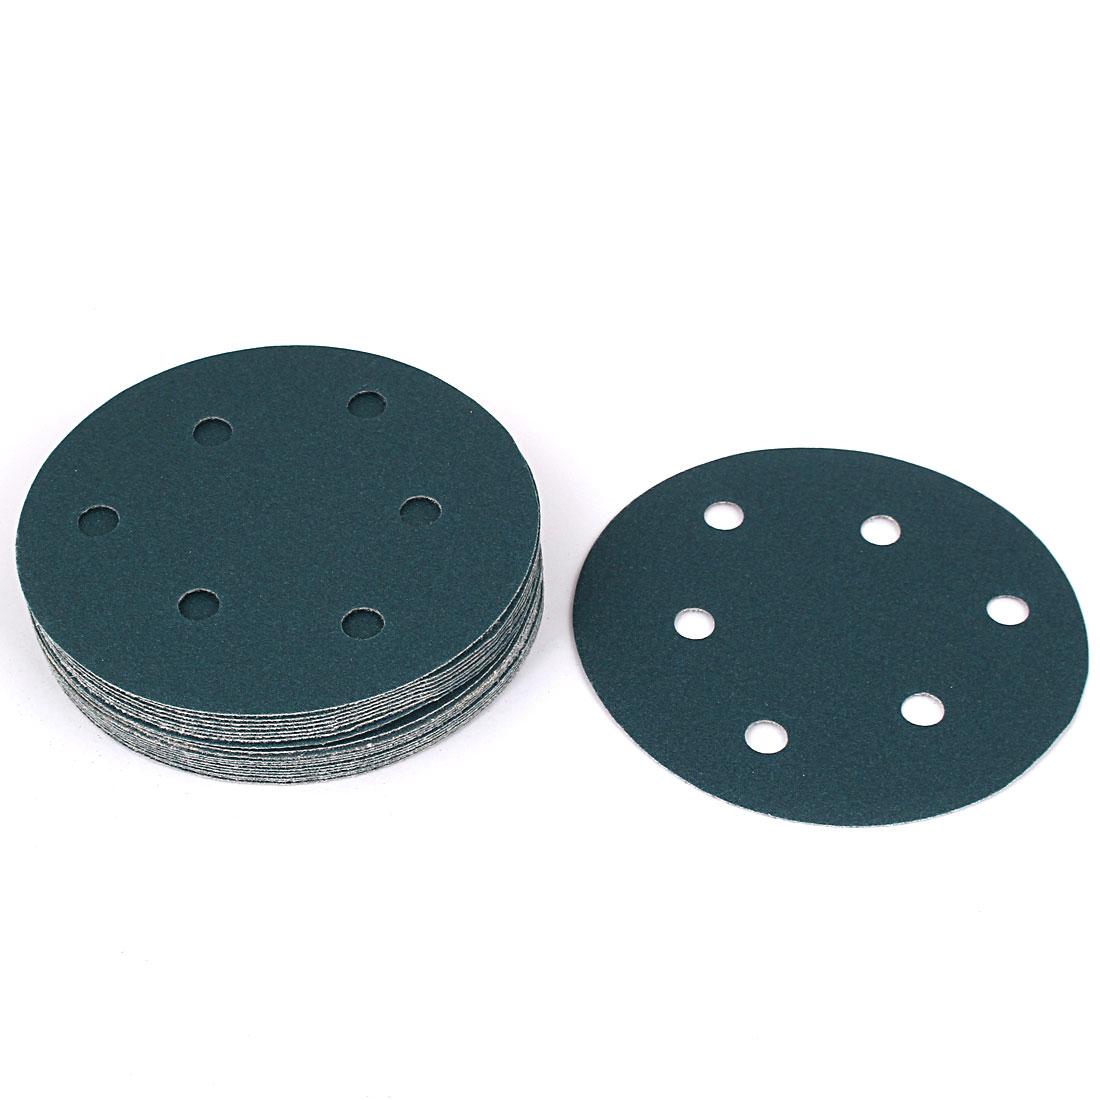 "5"" Sandpaper Auto Car Paint Polishing Sanding Disc Hook and Loop Fastener 6 Holes 180 Grit 20pcs"